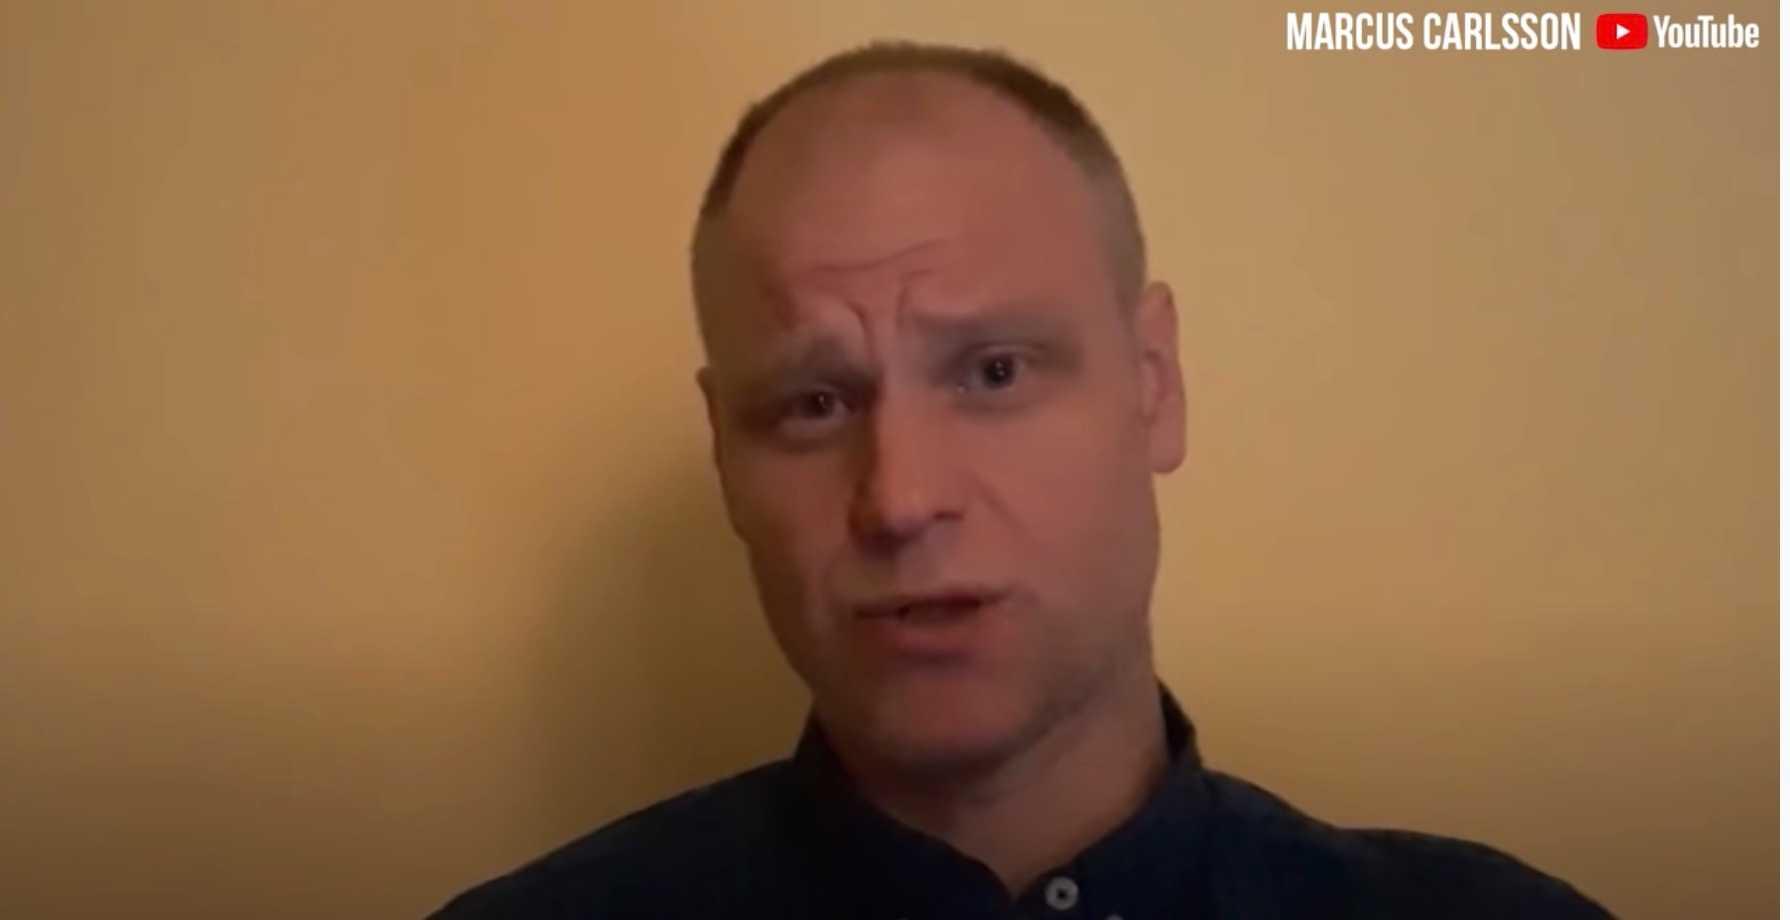 Marcus Carlsson, docent på matematikcentrum vid Lunds universitet